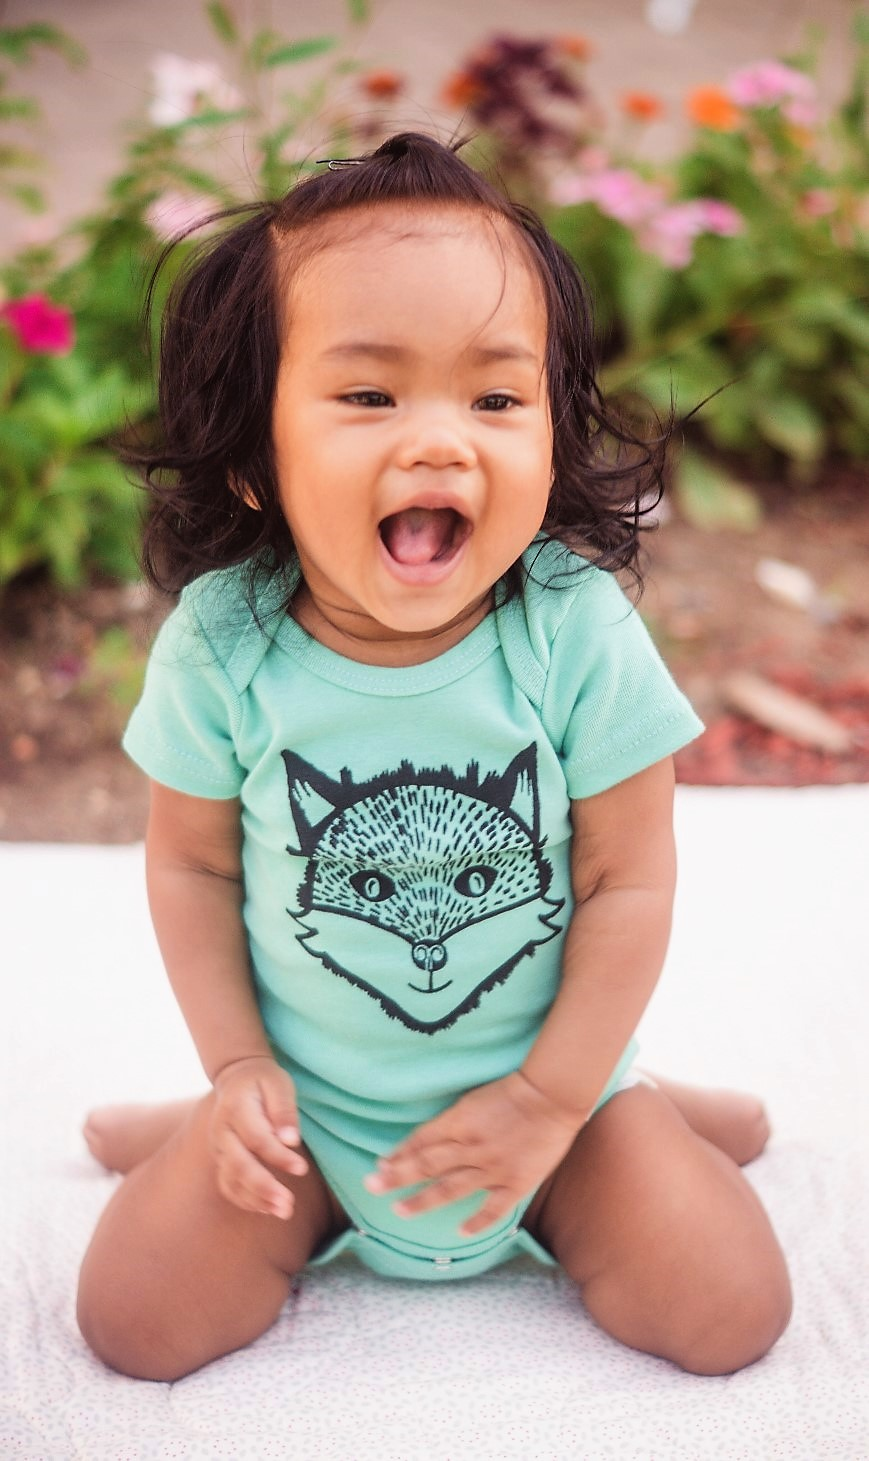 "Yinibini Baby model wearing 'Clever Like a Fox"" One-Piece in Seafoam."